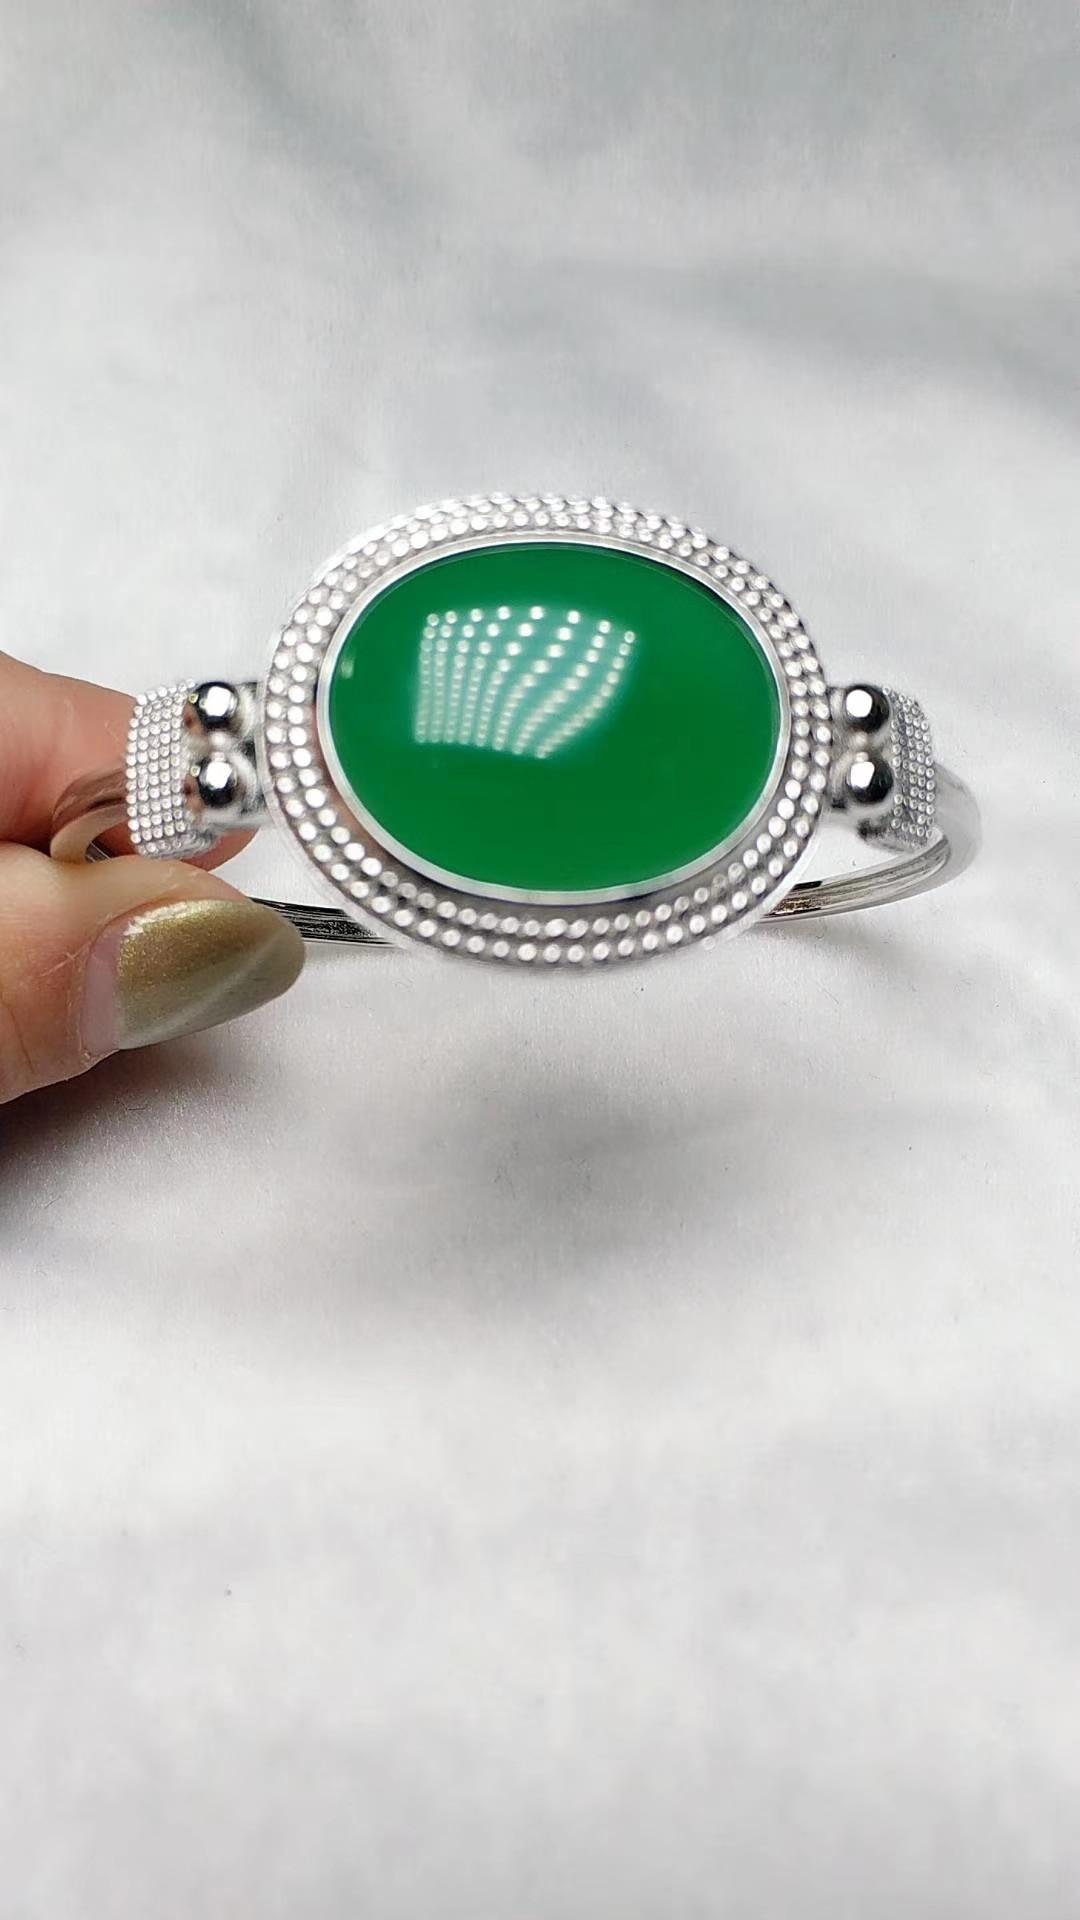 Koraba Fine Jewelry Sterling S925 Silver Bangle Jade Bracelet Free ShippingKoraba Fine Jewelry Sterling S925 Silver Bangle Jade Bracelet Free Shipping